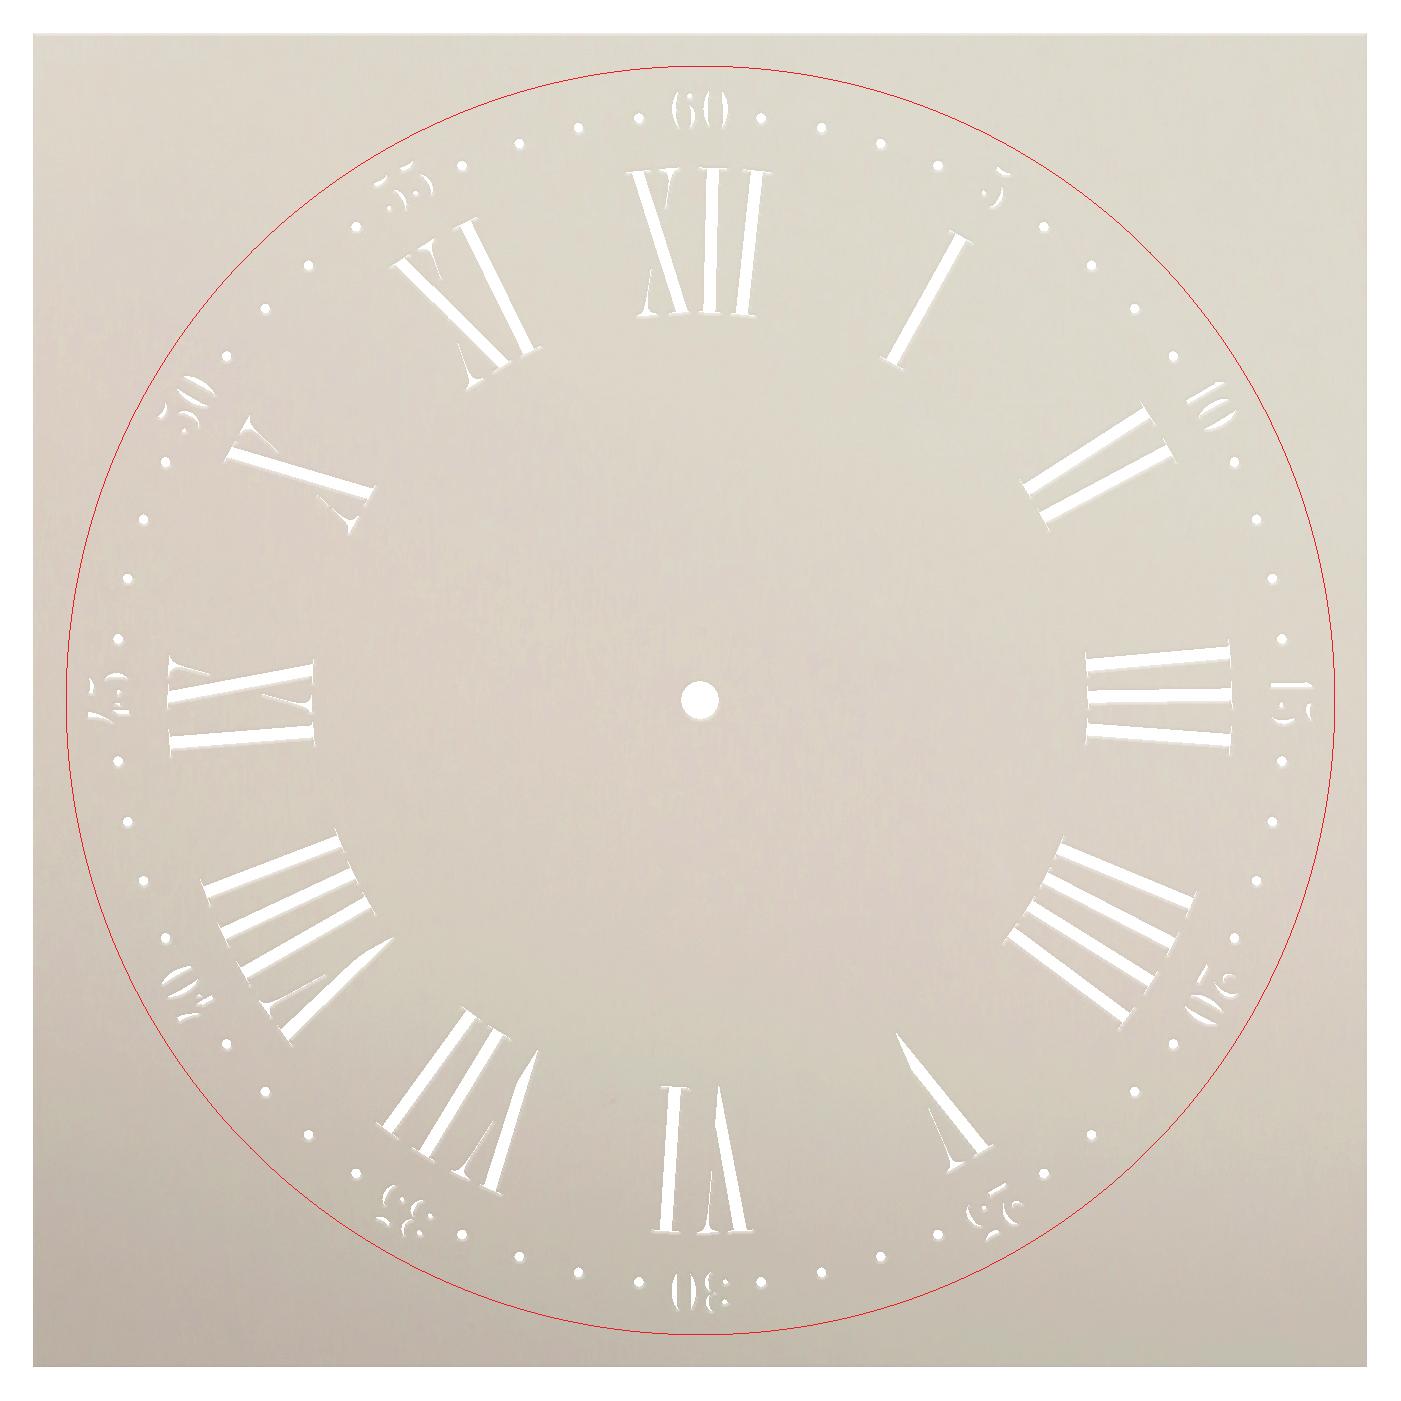 Nantucket Clock Stencil - 18 inch Clock